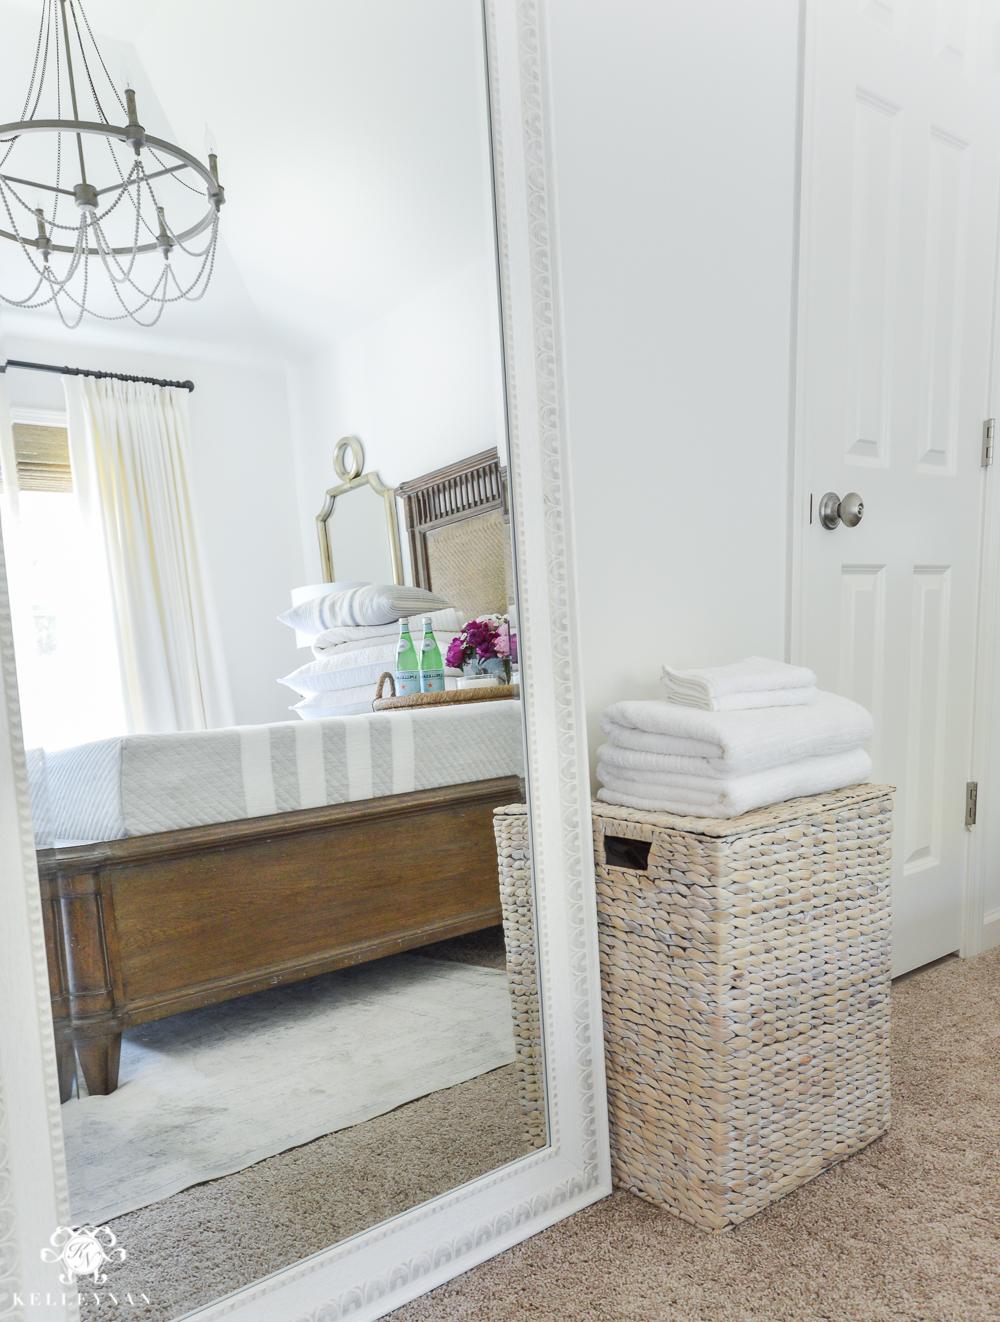 Guest Bedroom, Guest Bedroom Tips and Tricks, Guest Bedroom Hacks, How to Decorate Your Guest Bedroom, DIY Home, DIY Home Decor, Home Decor Hacks